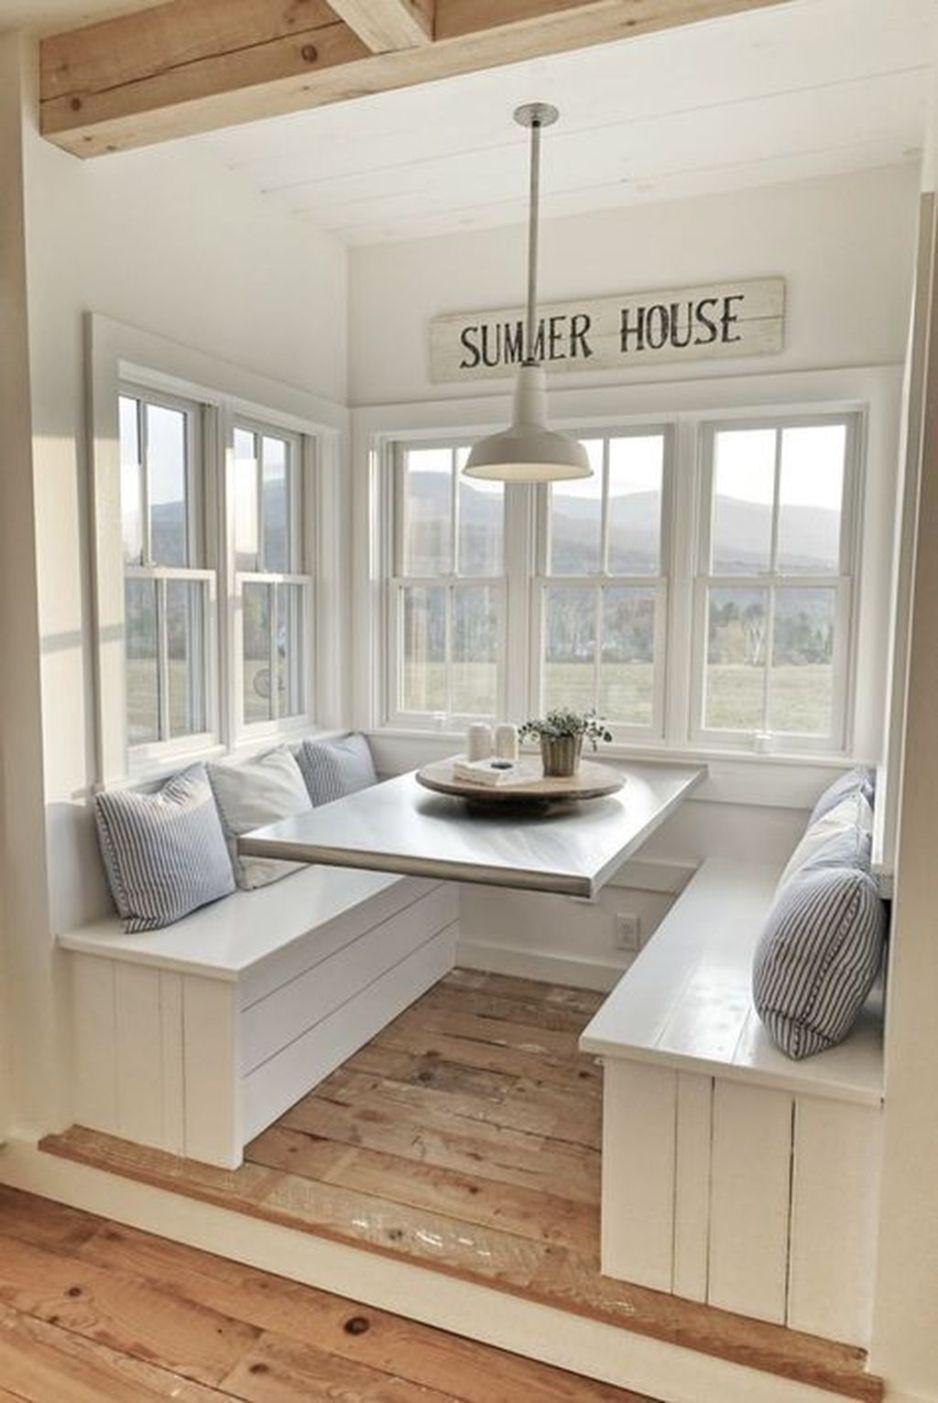 44 Awesome Modern Farmhouse Decor Ideas - decoomo.com #modernfarmhouse